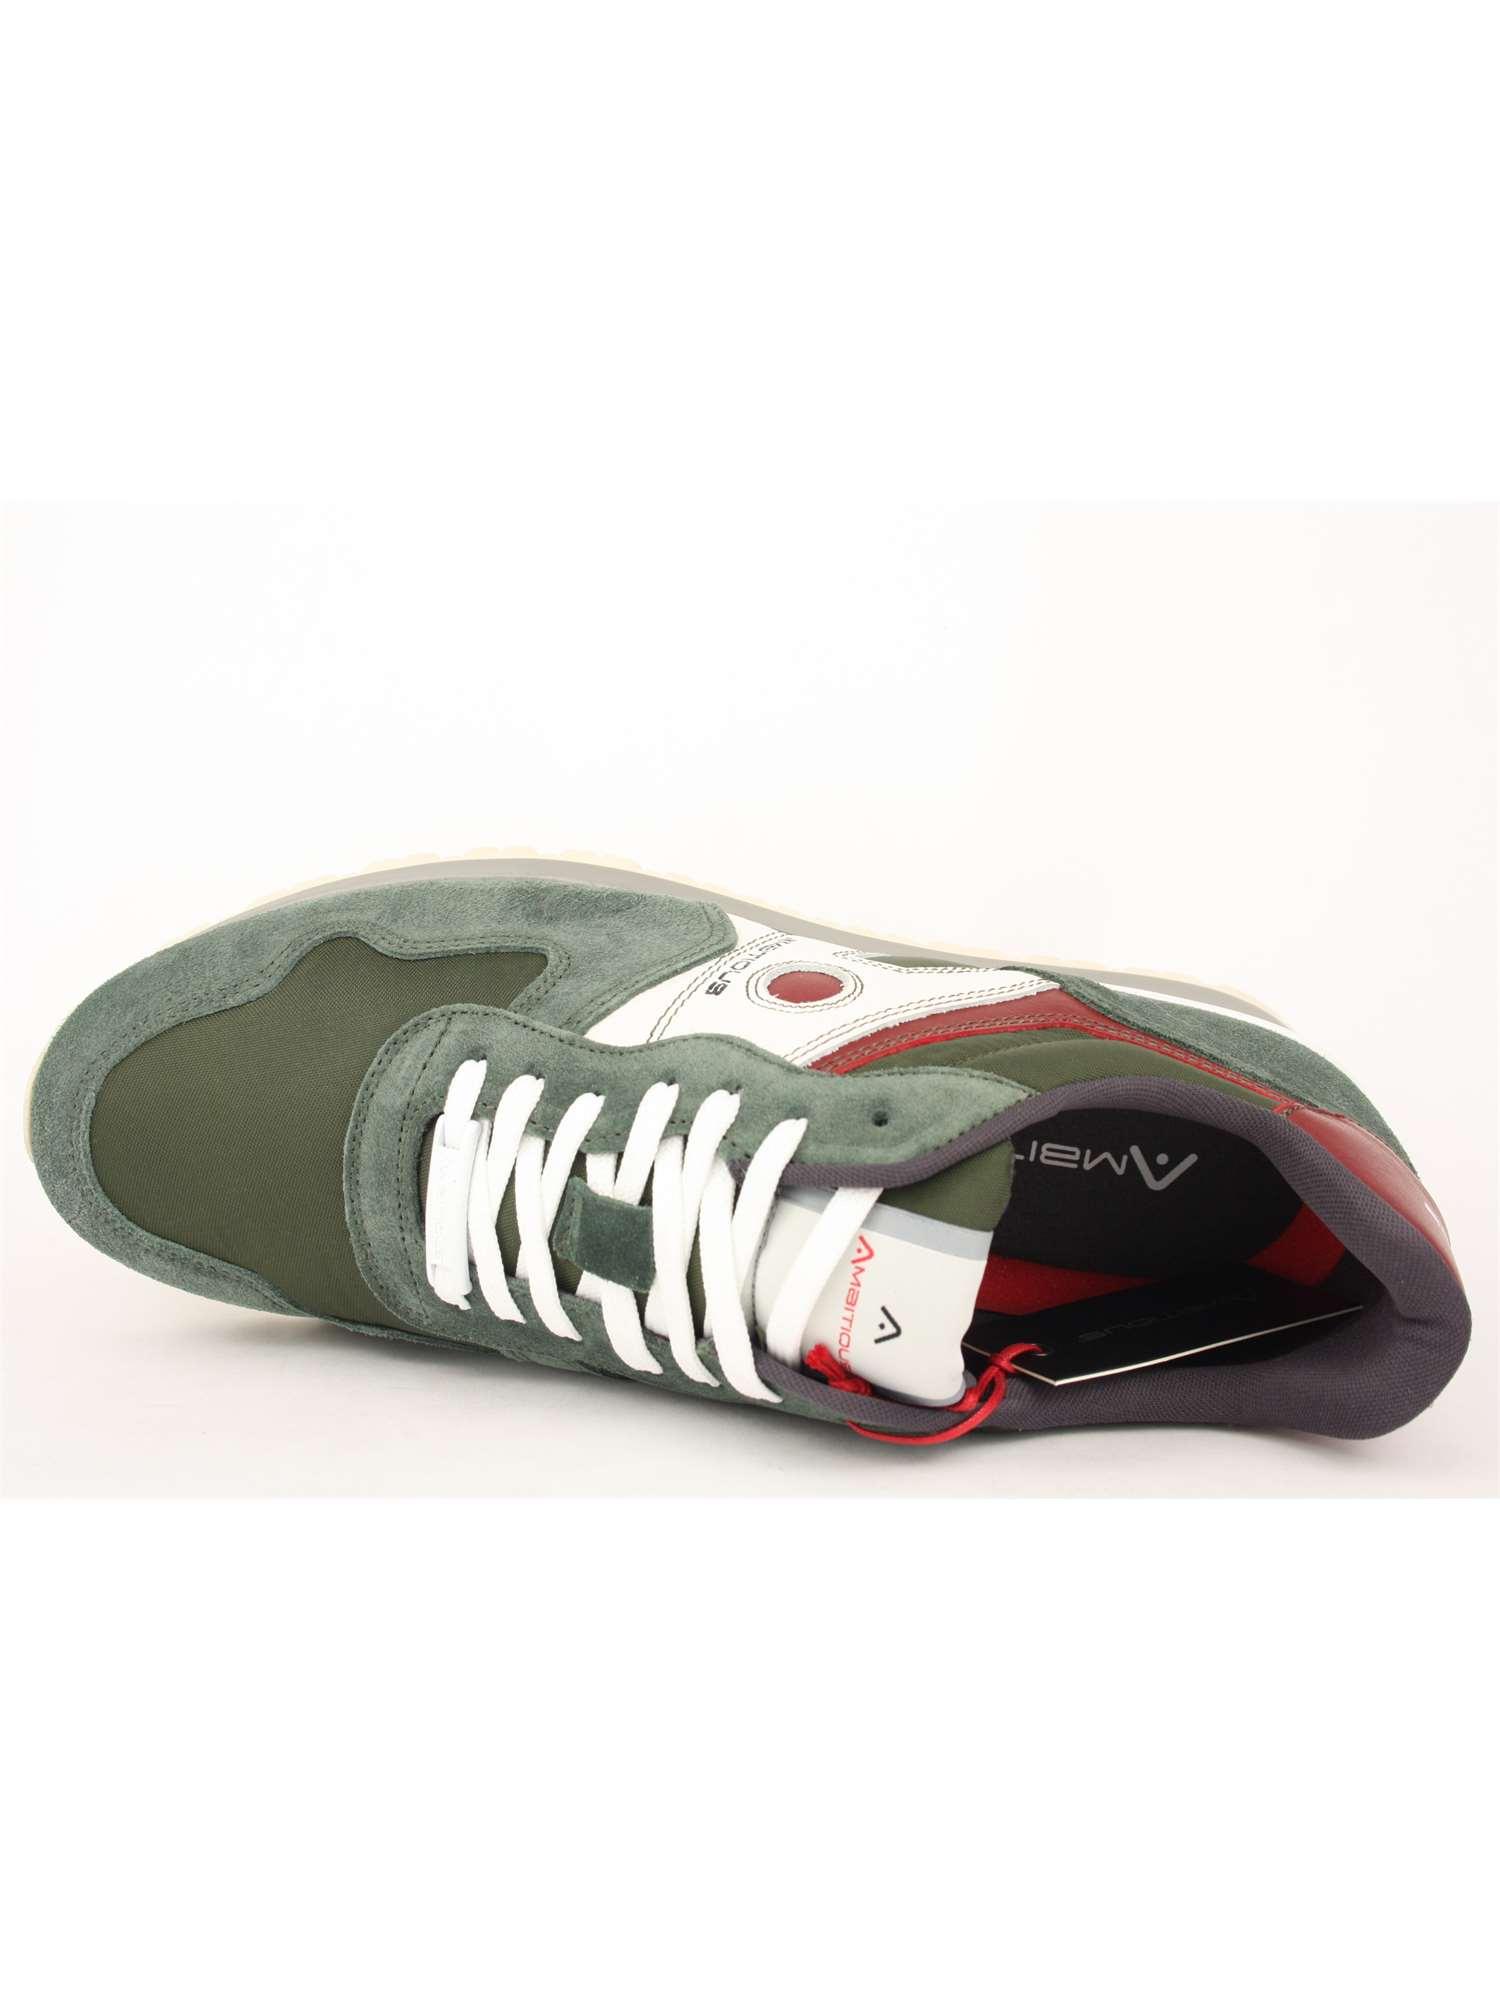 Ambitious Shoes Lacci Verde  7da1e3ffab6